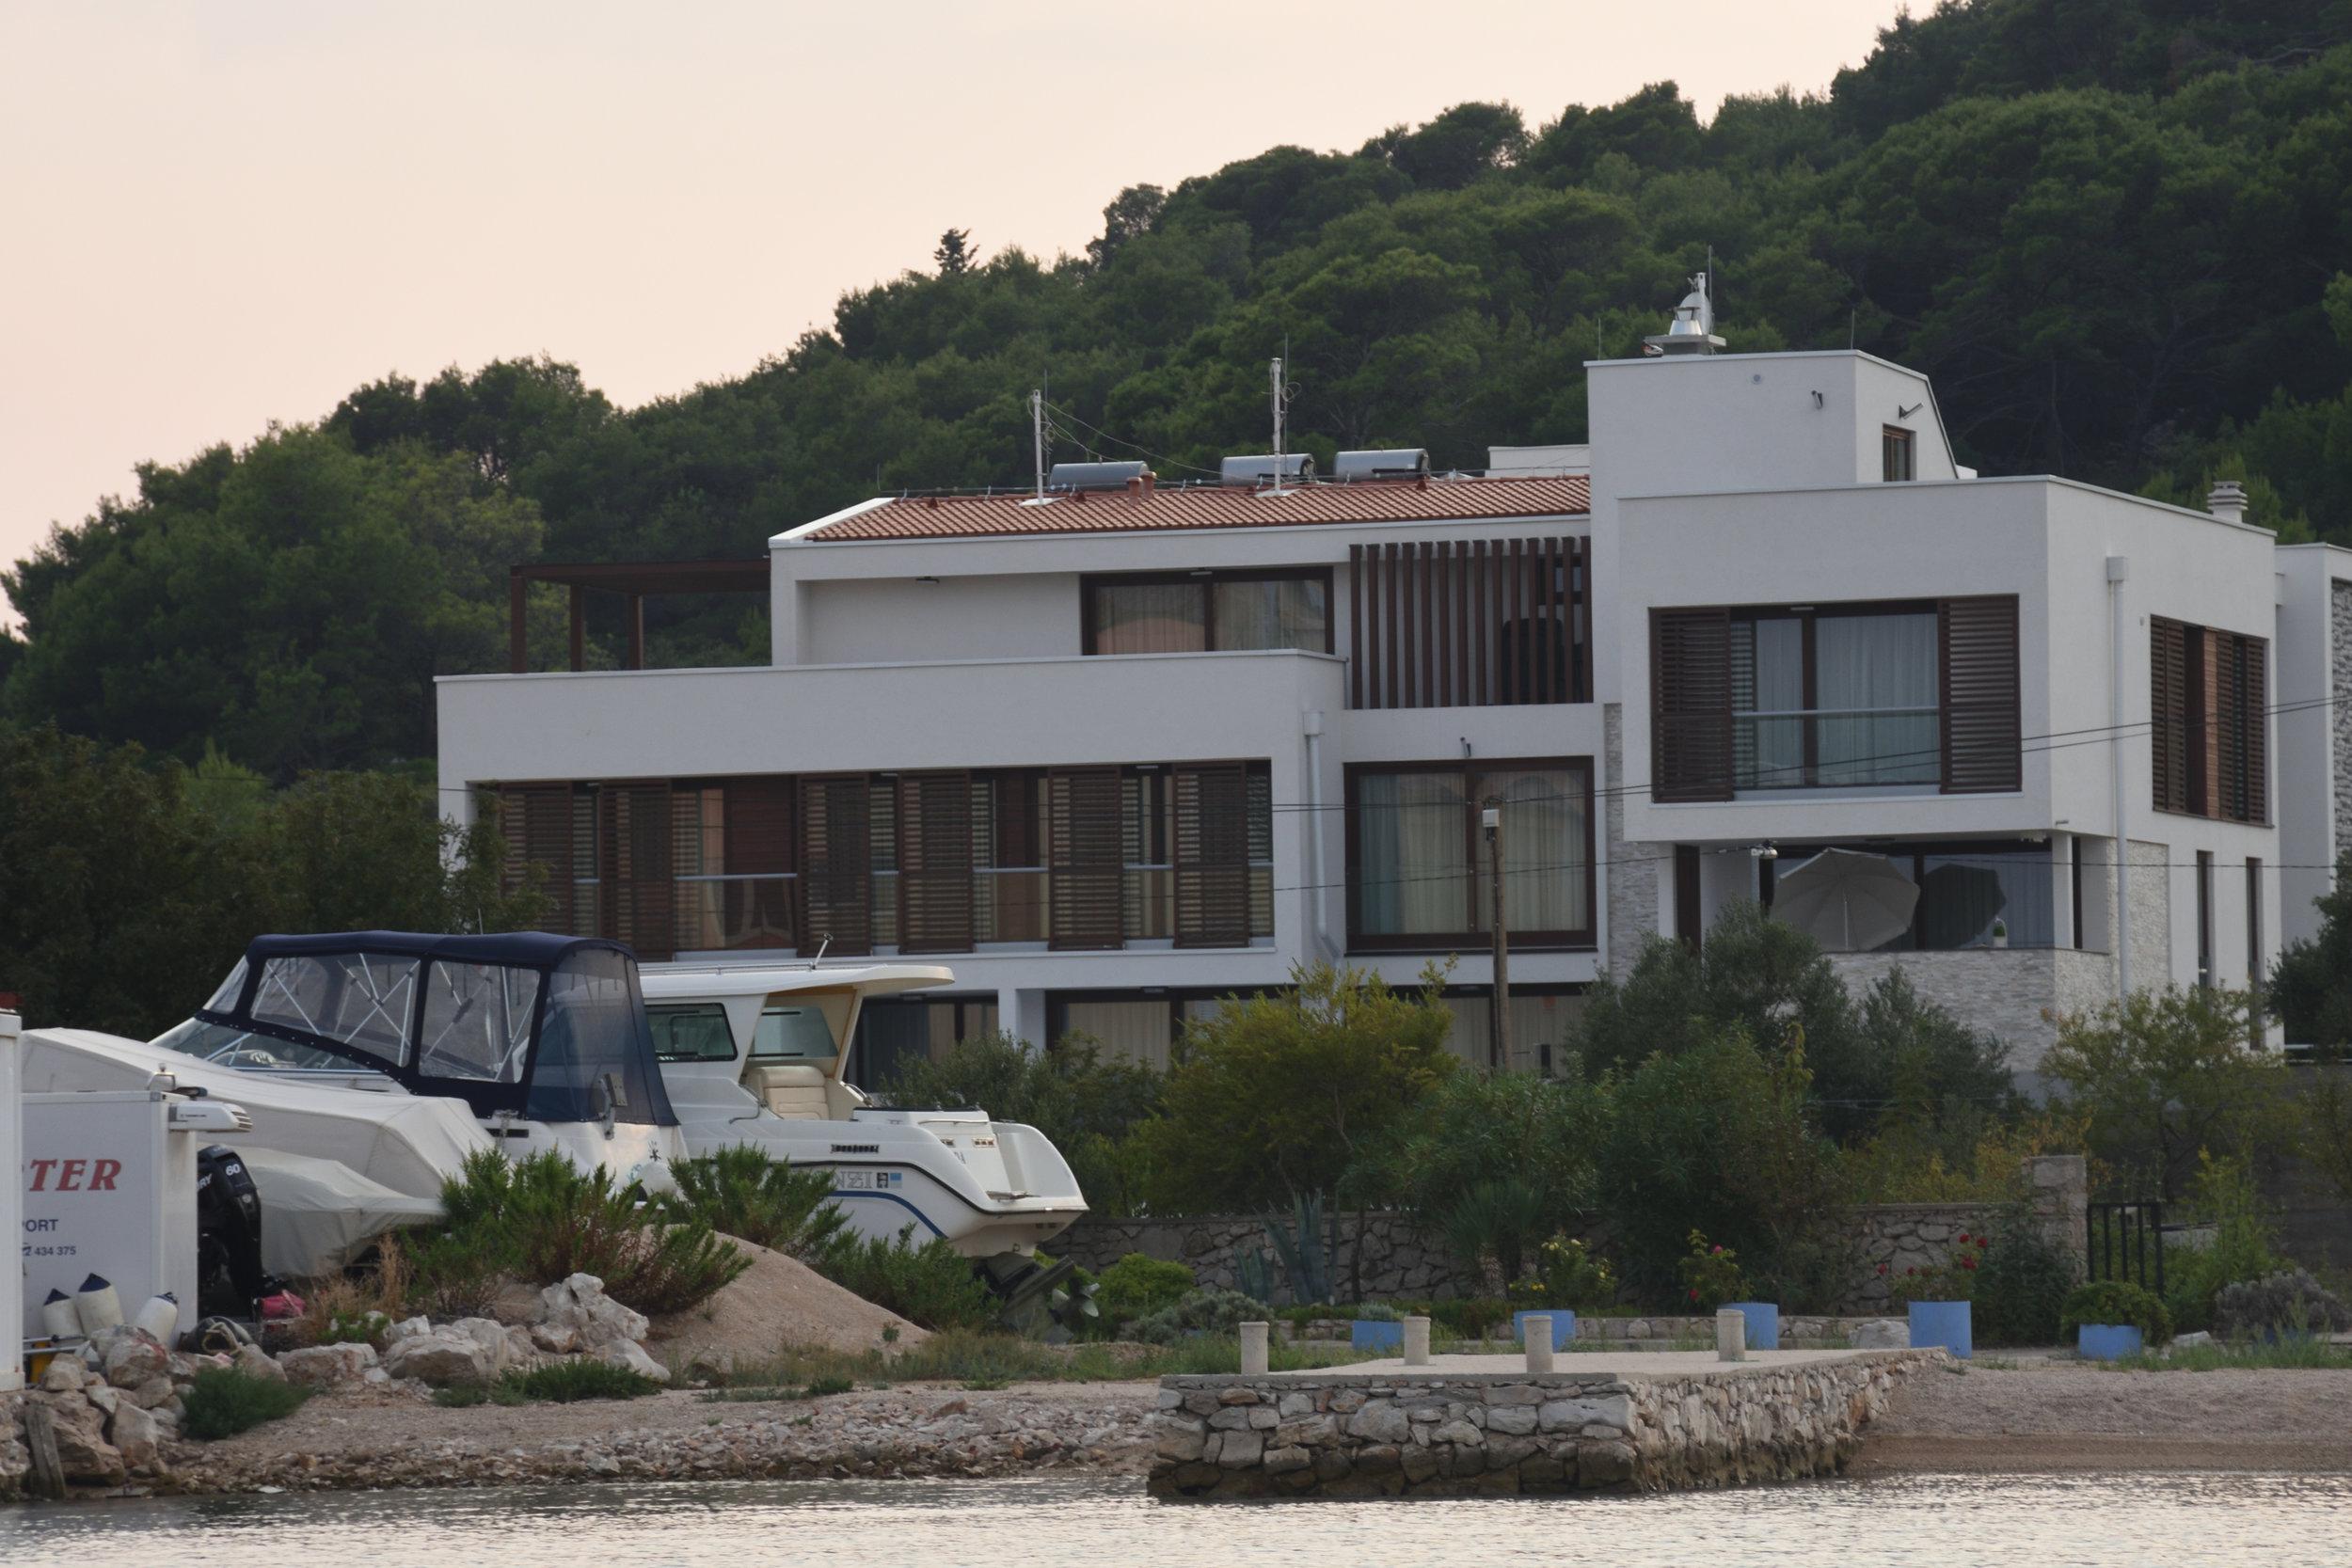 Our house, Murter, Croatia 2016